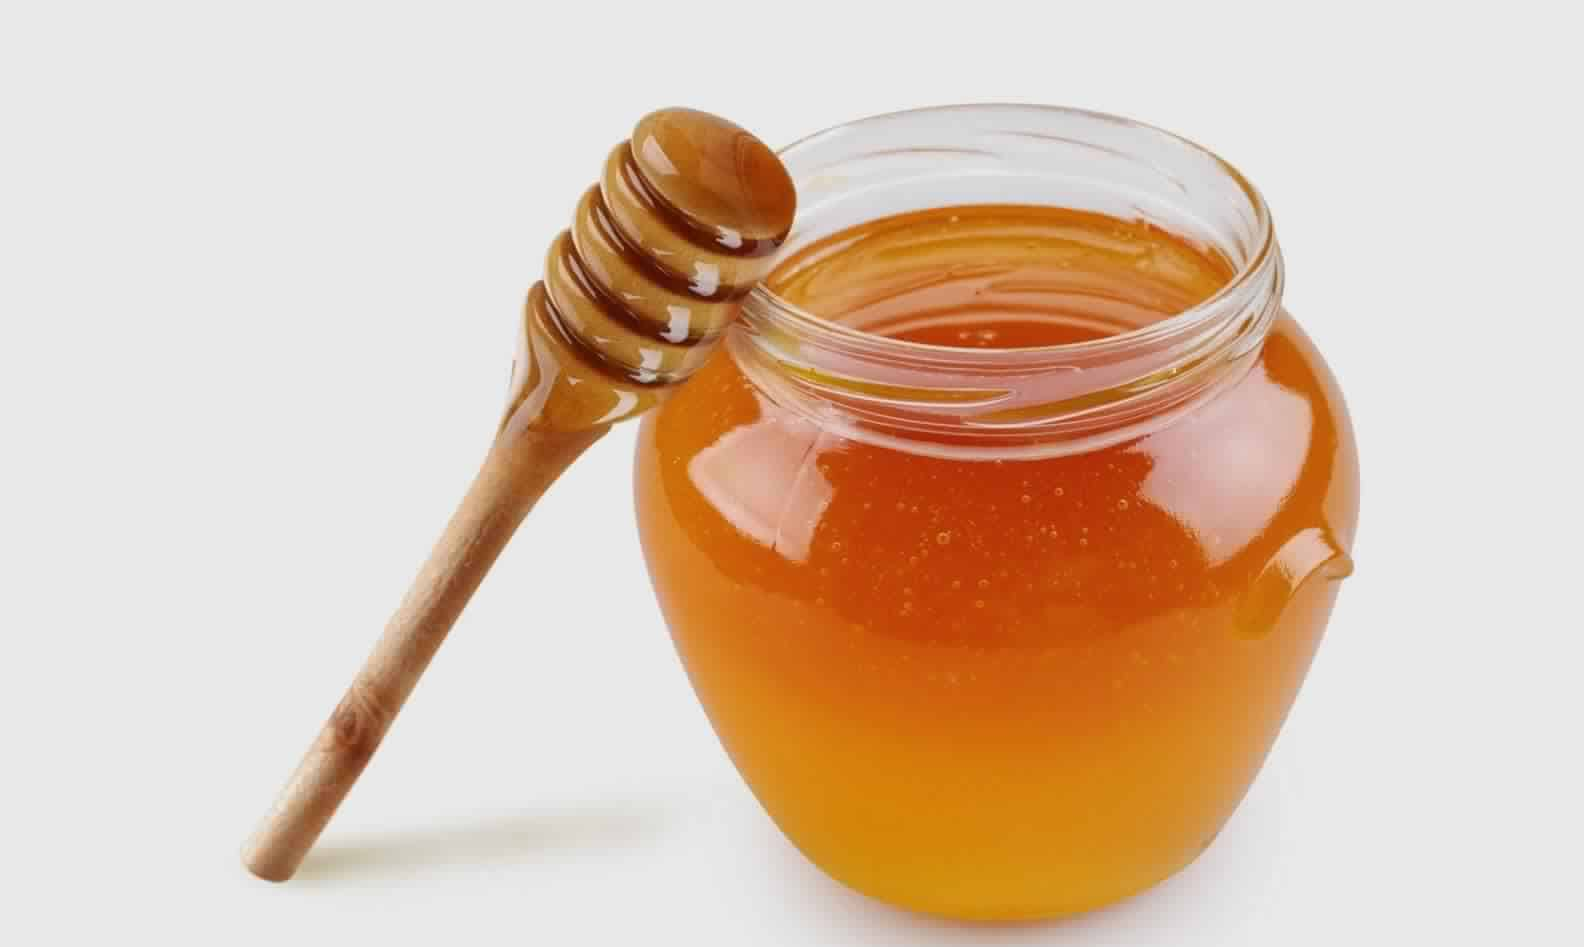 عسل اصلي للعلاج